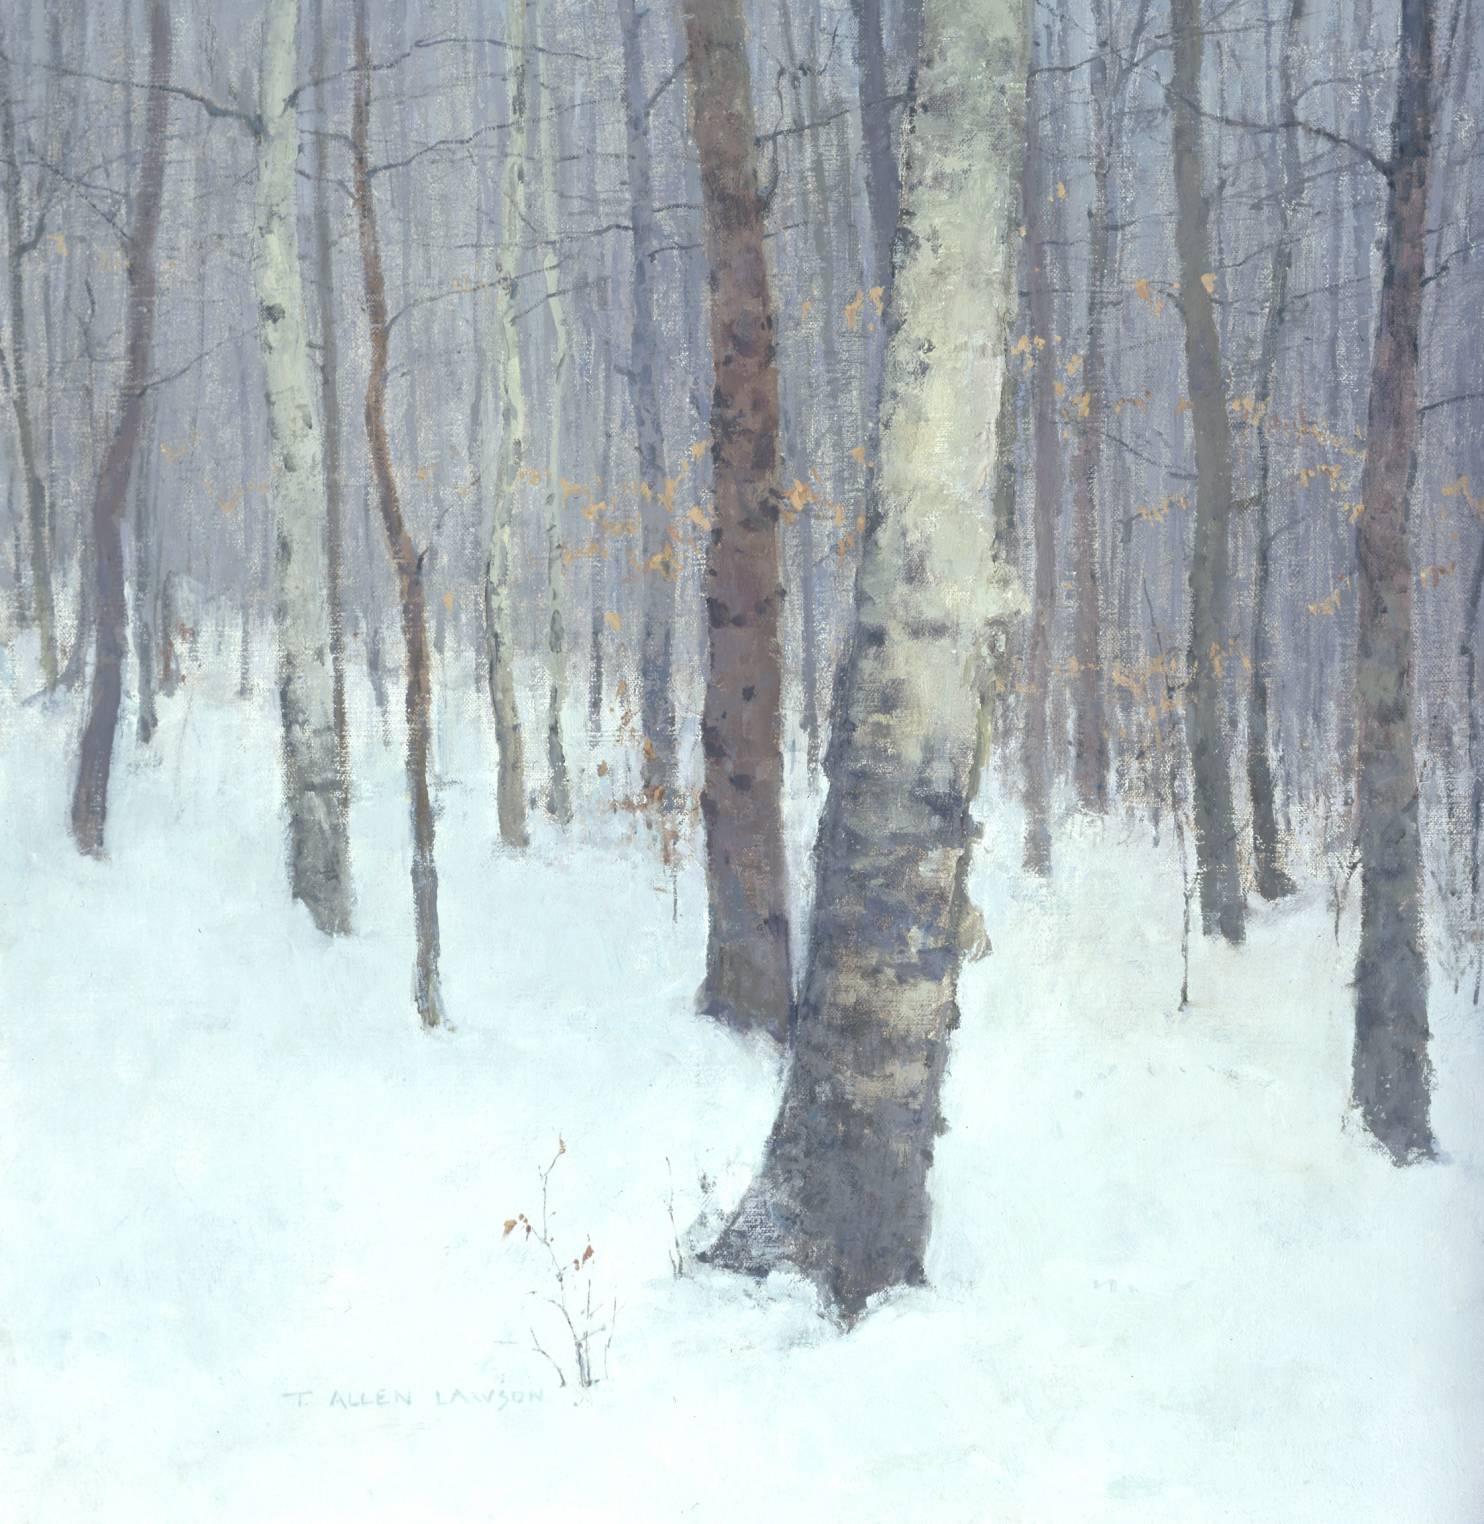 In the Woods - Winter, oil on linen, 20 x 19 in.